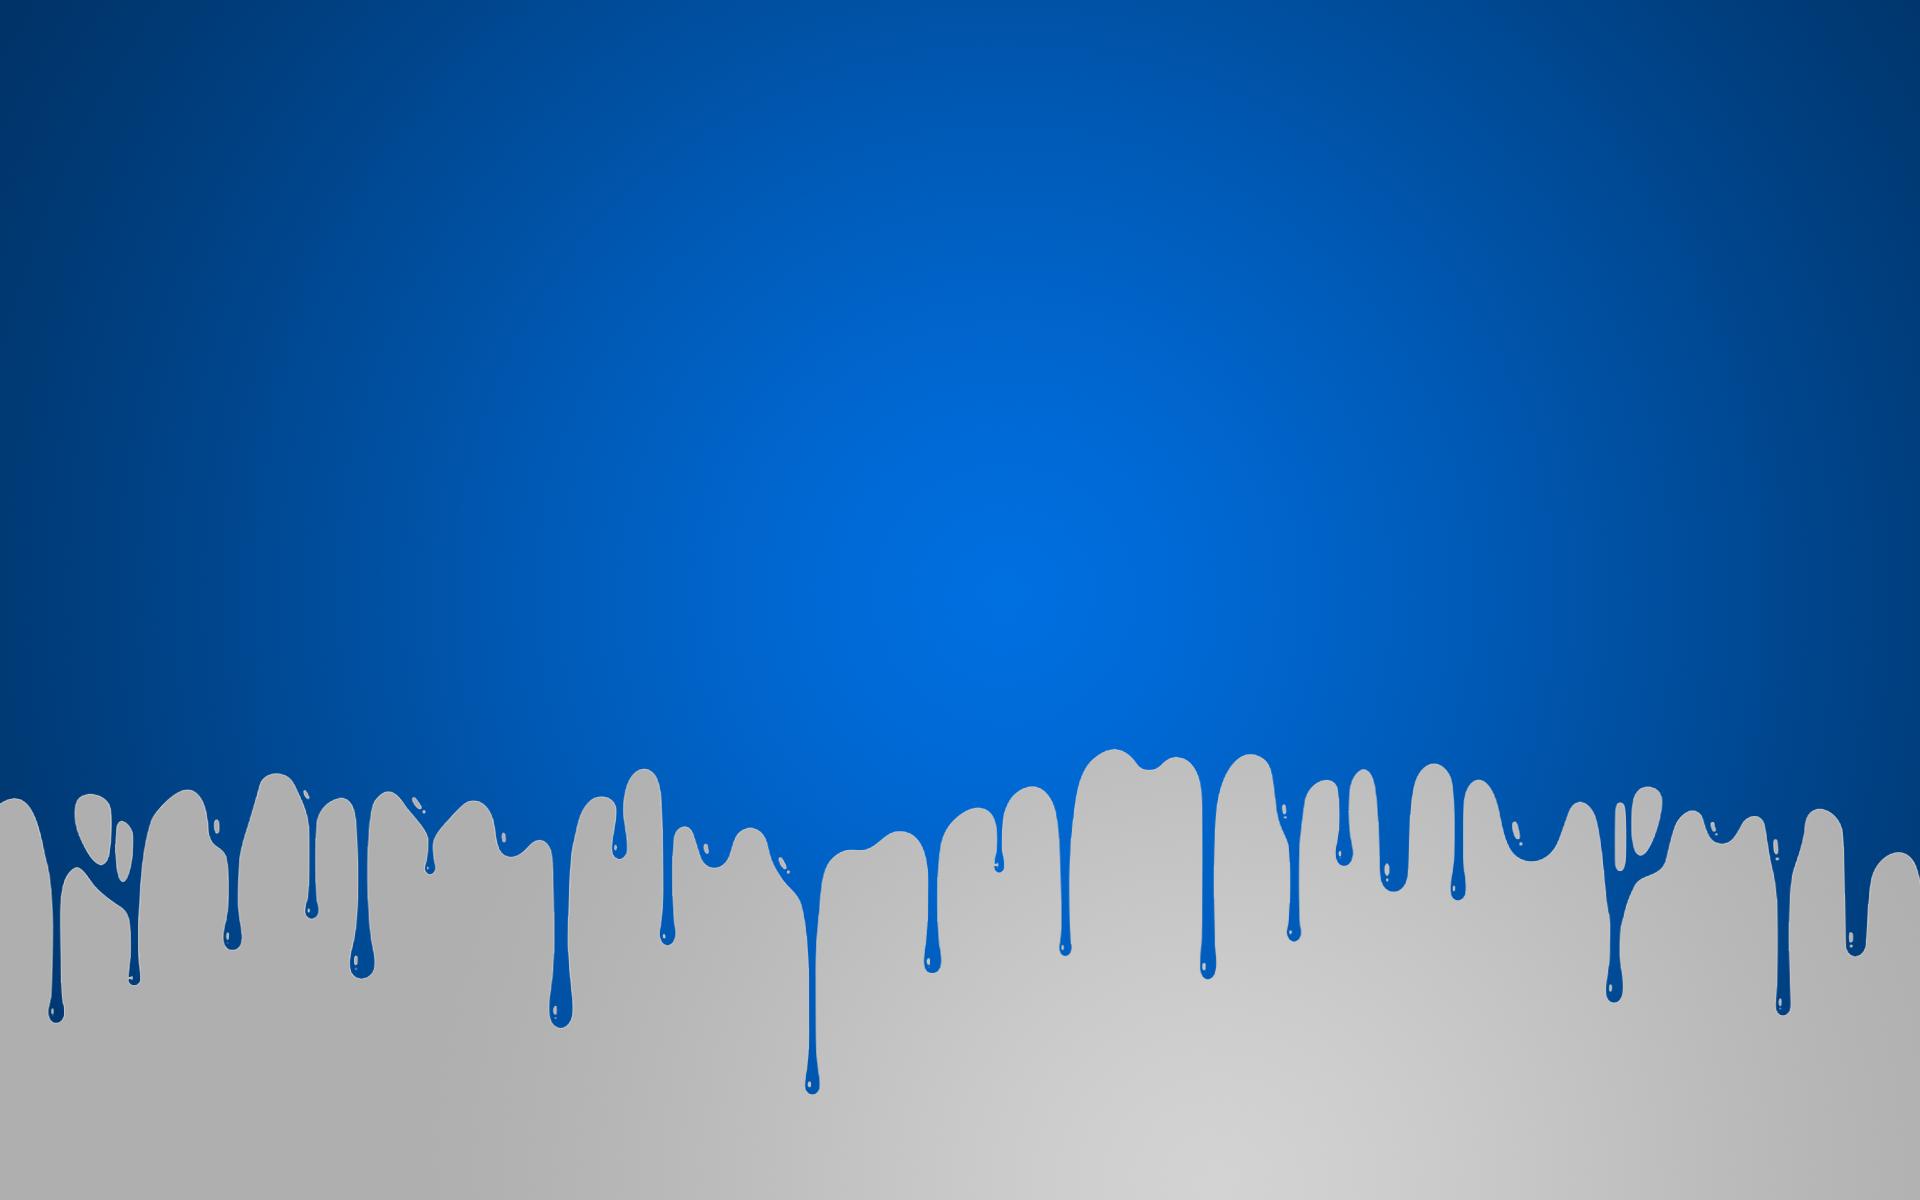 Sfondi Illustrazione Arte Digitale Testo Logo Blu Tinta Unita